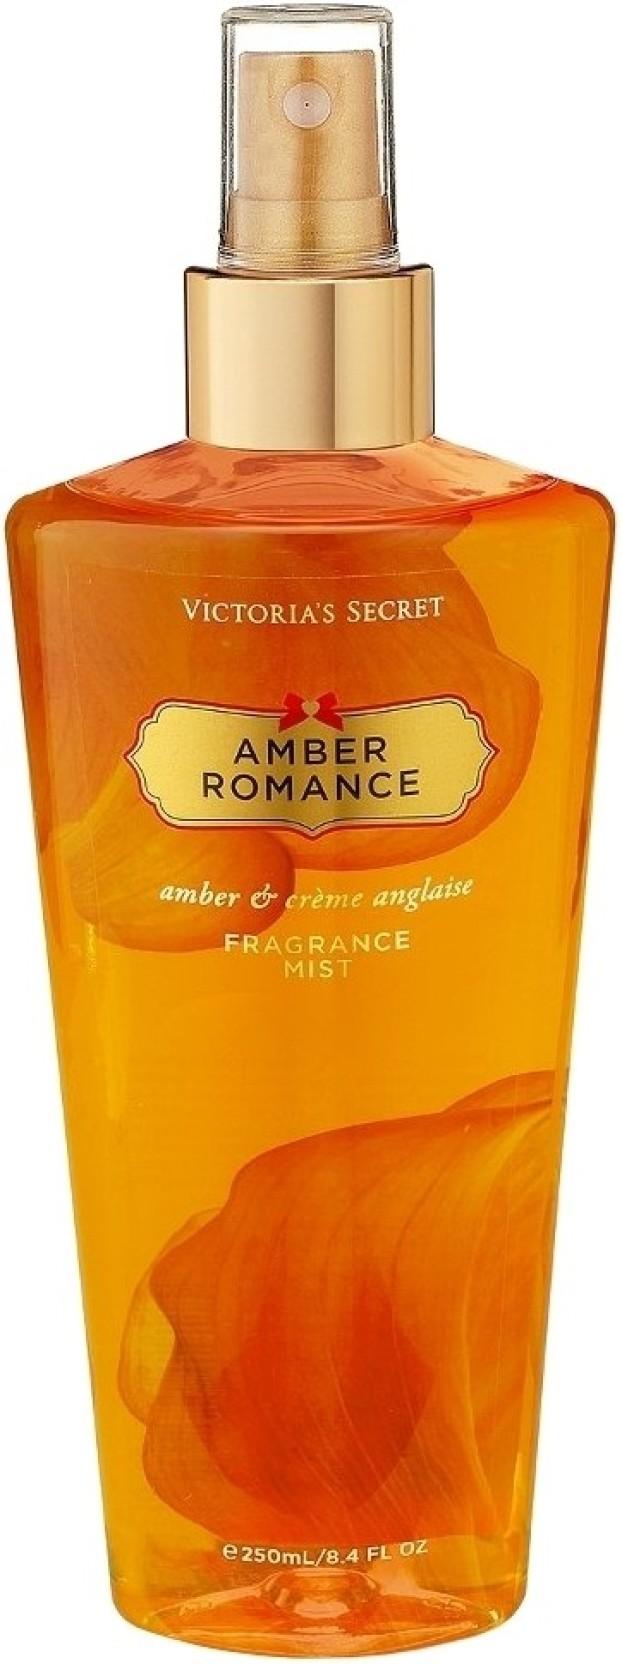 Kempluk Besek Pipiti Tomplok Kotak Makanan No3 Daftar Harga Elektronik Lunch Box Sj0052 Victoria S Secret Amber Romance Fragrance Body Mist For Women Add To Cart